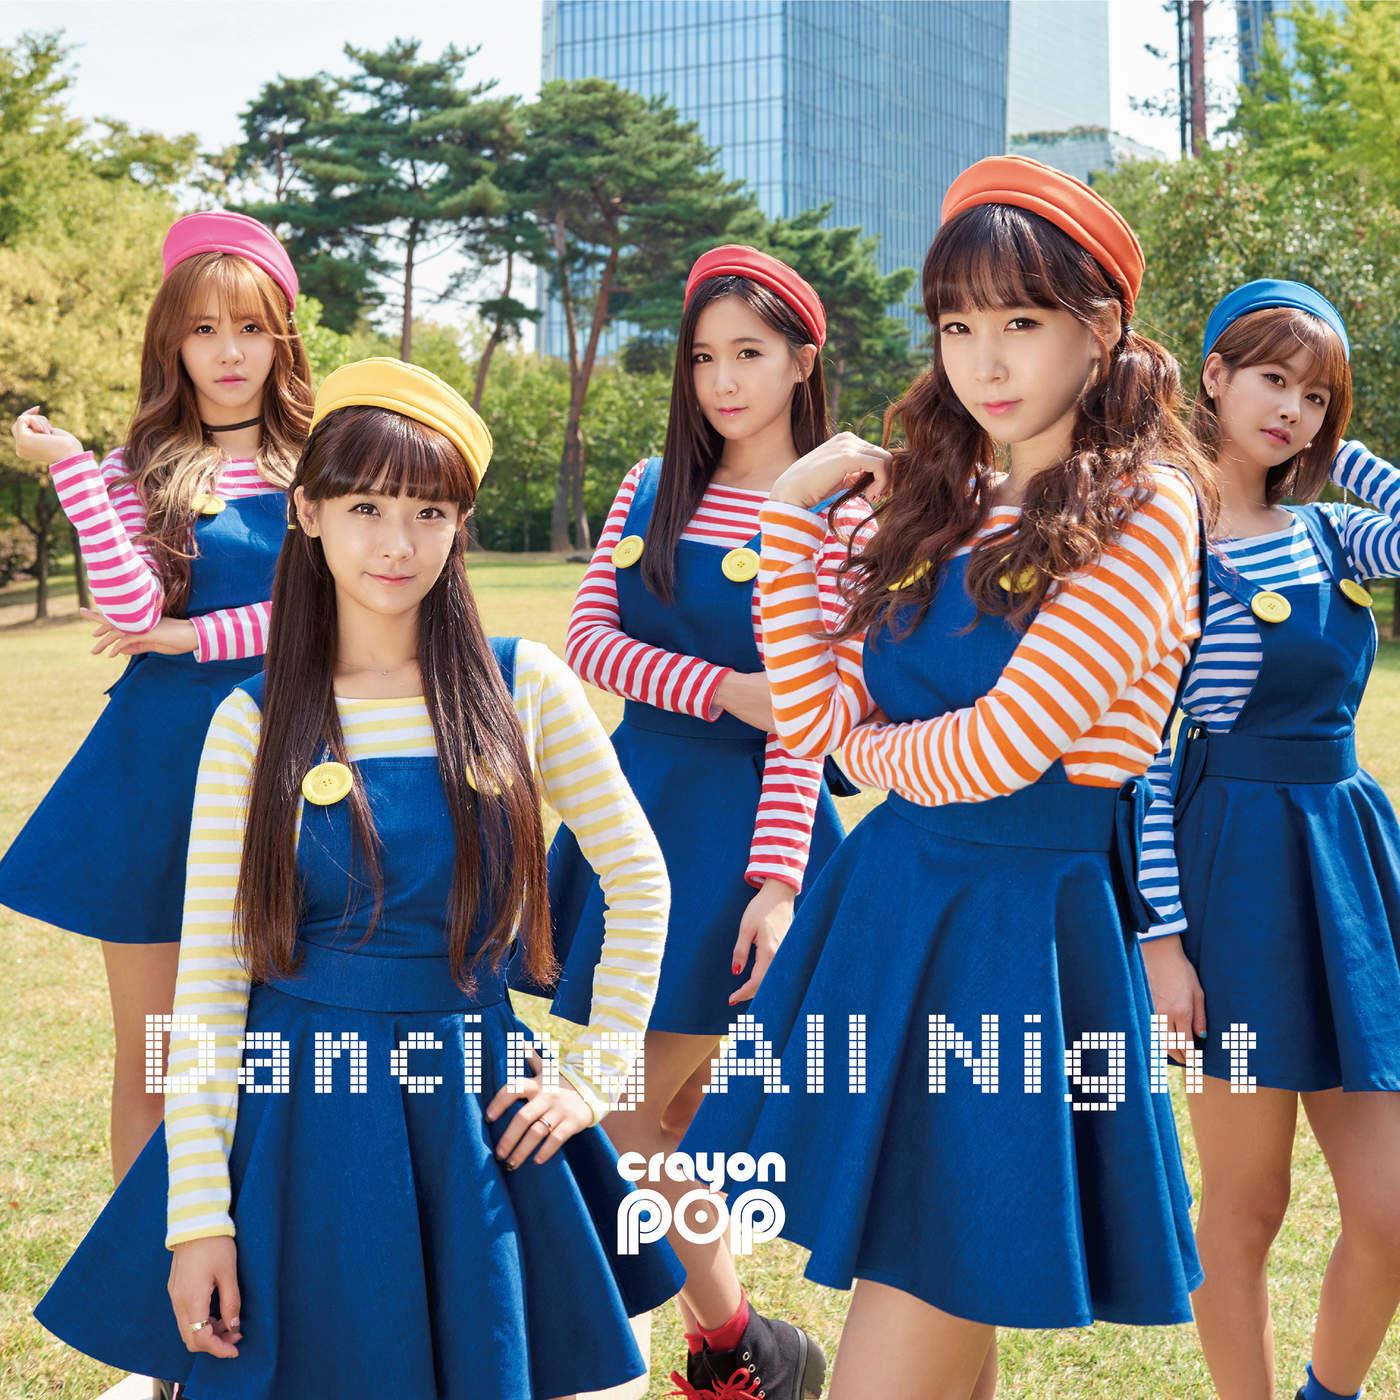 Crayon Pop - Dancing All Night - Uh-ee K2Ost free mp3 download korean song kpop kdrama ost lyric 320 kbps